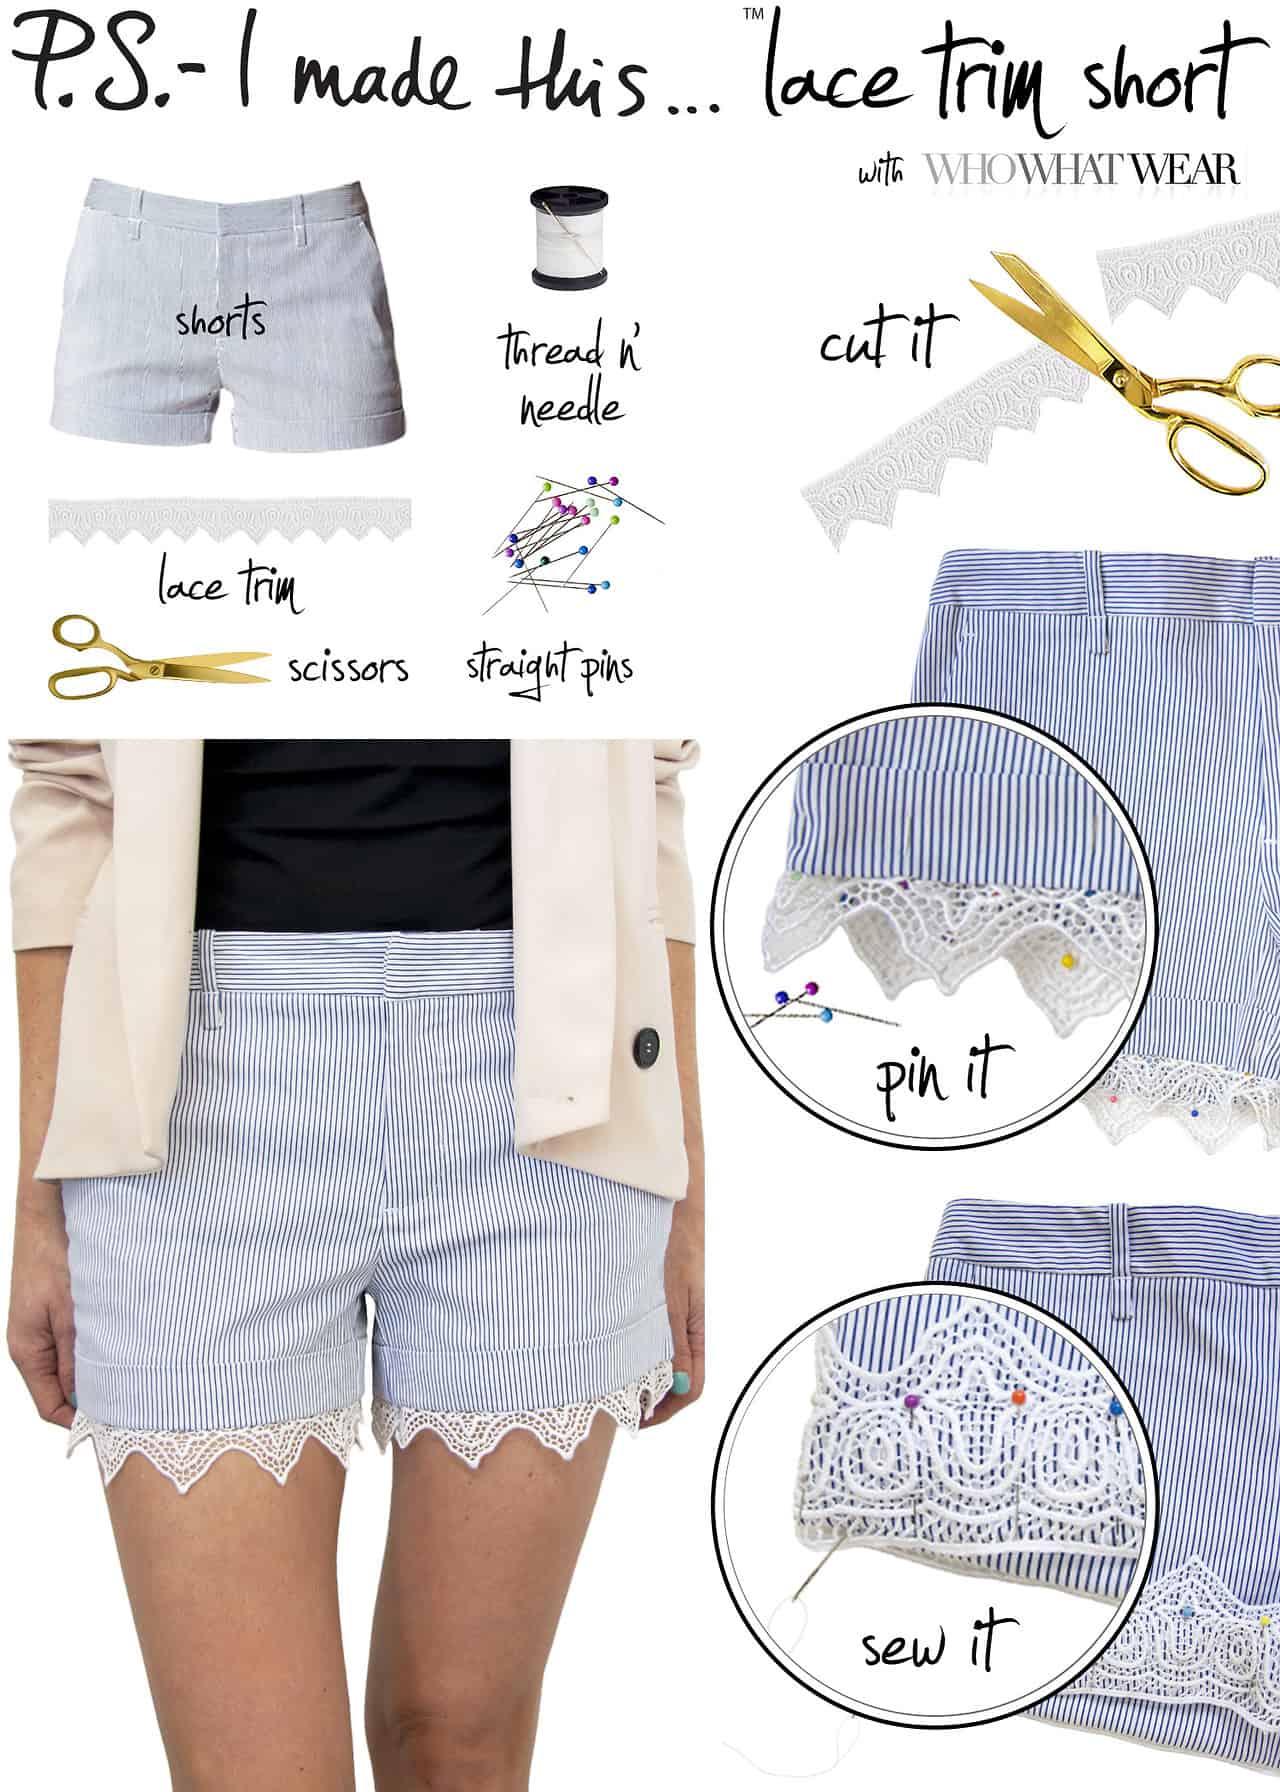 Super lace trimmed shorts